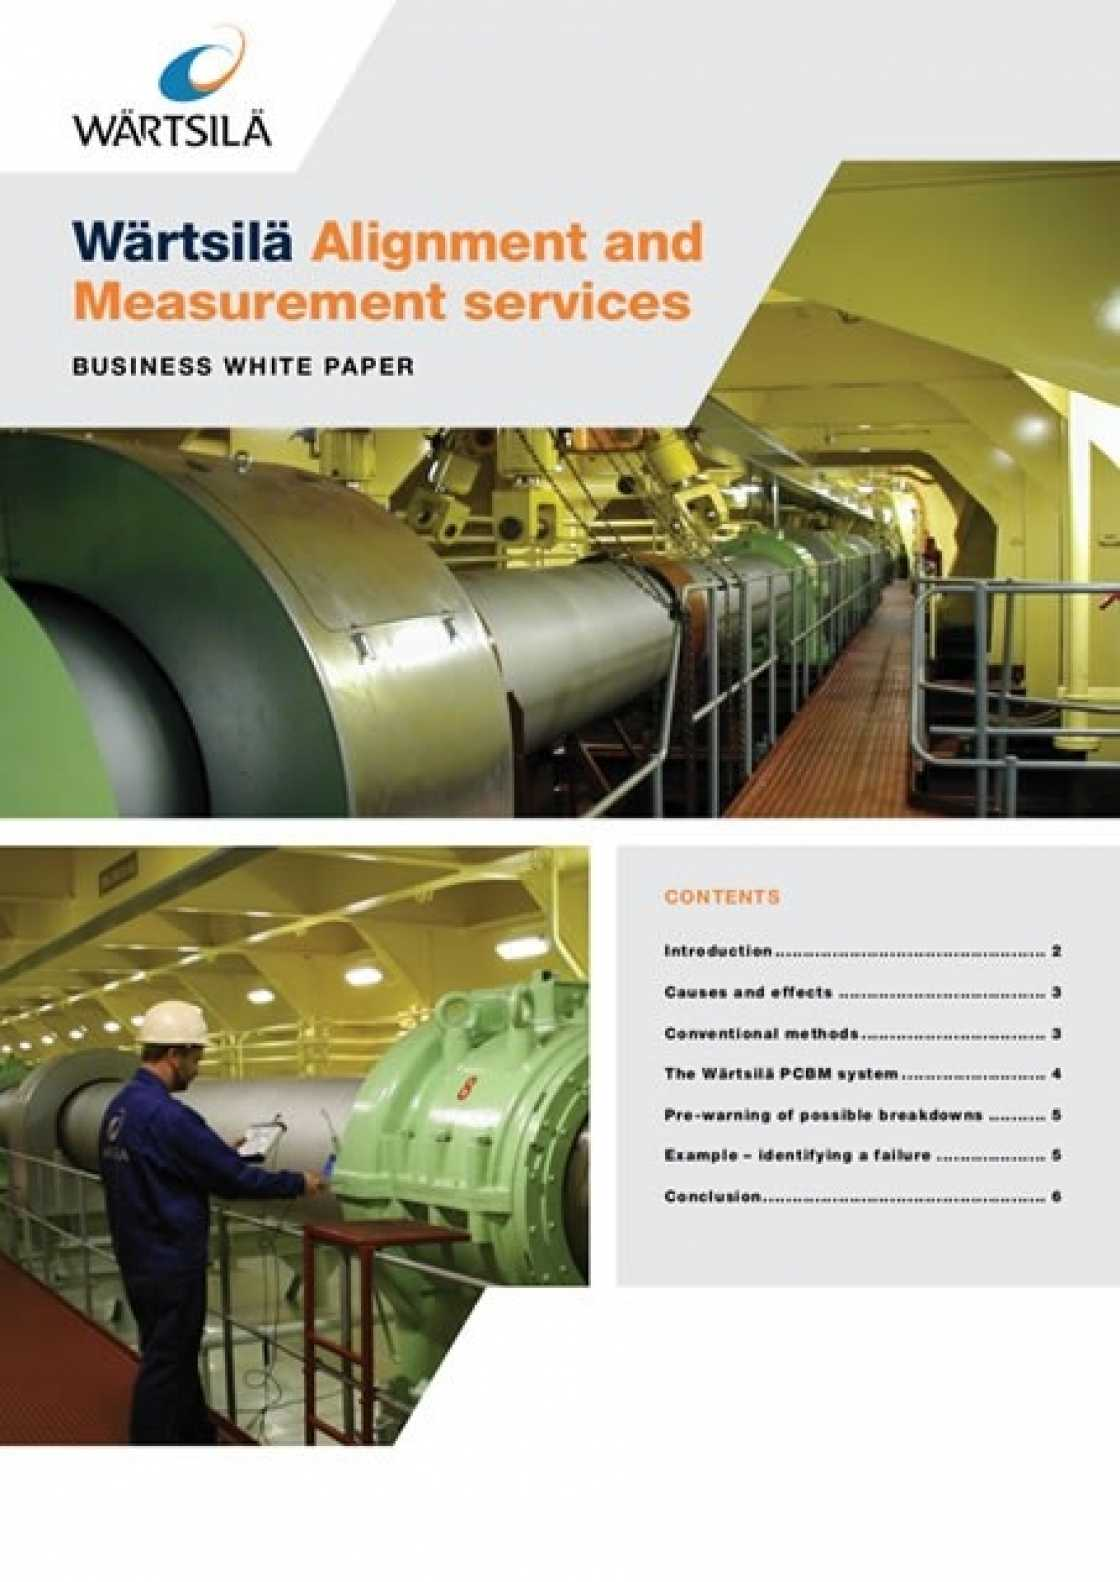 Whitepaper: Alignment and Measurement services - Wärtsilä